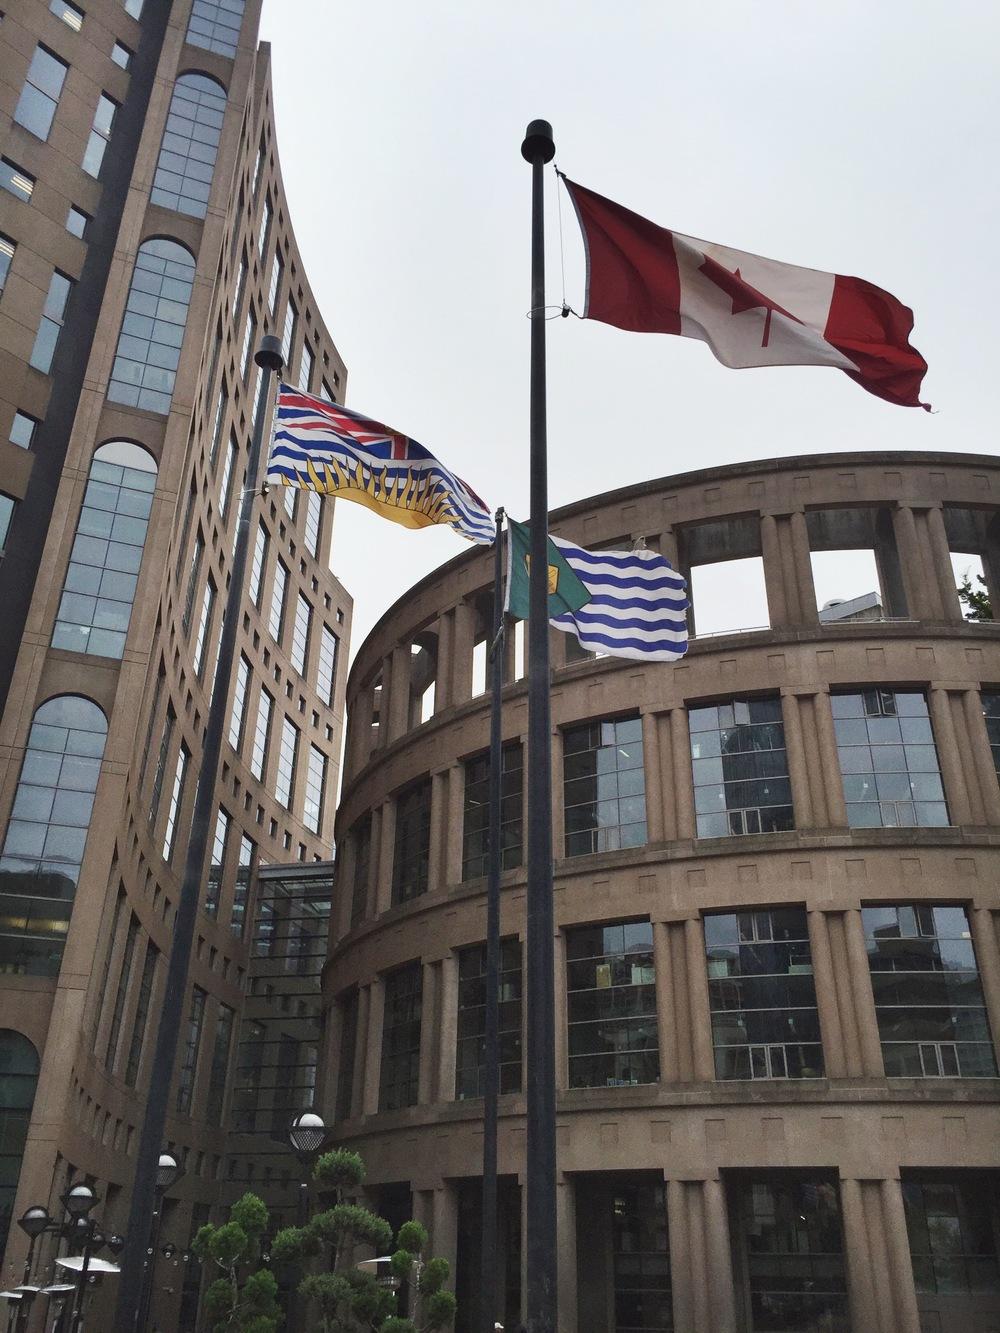 A Rainy Day in Vancouver, B.C. | truelane